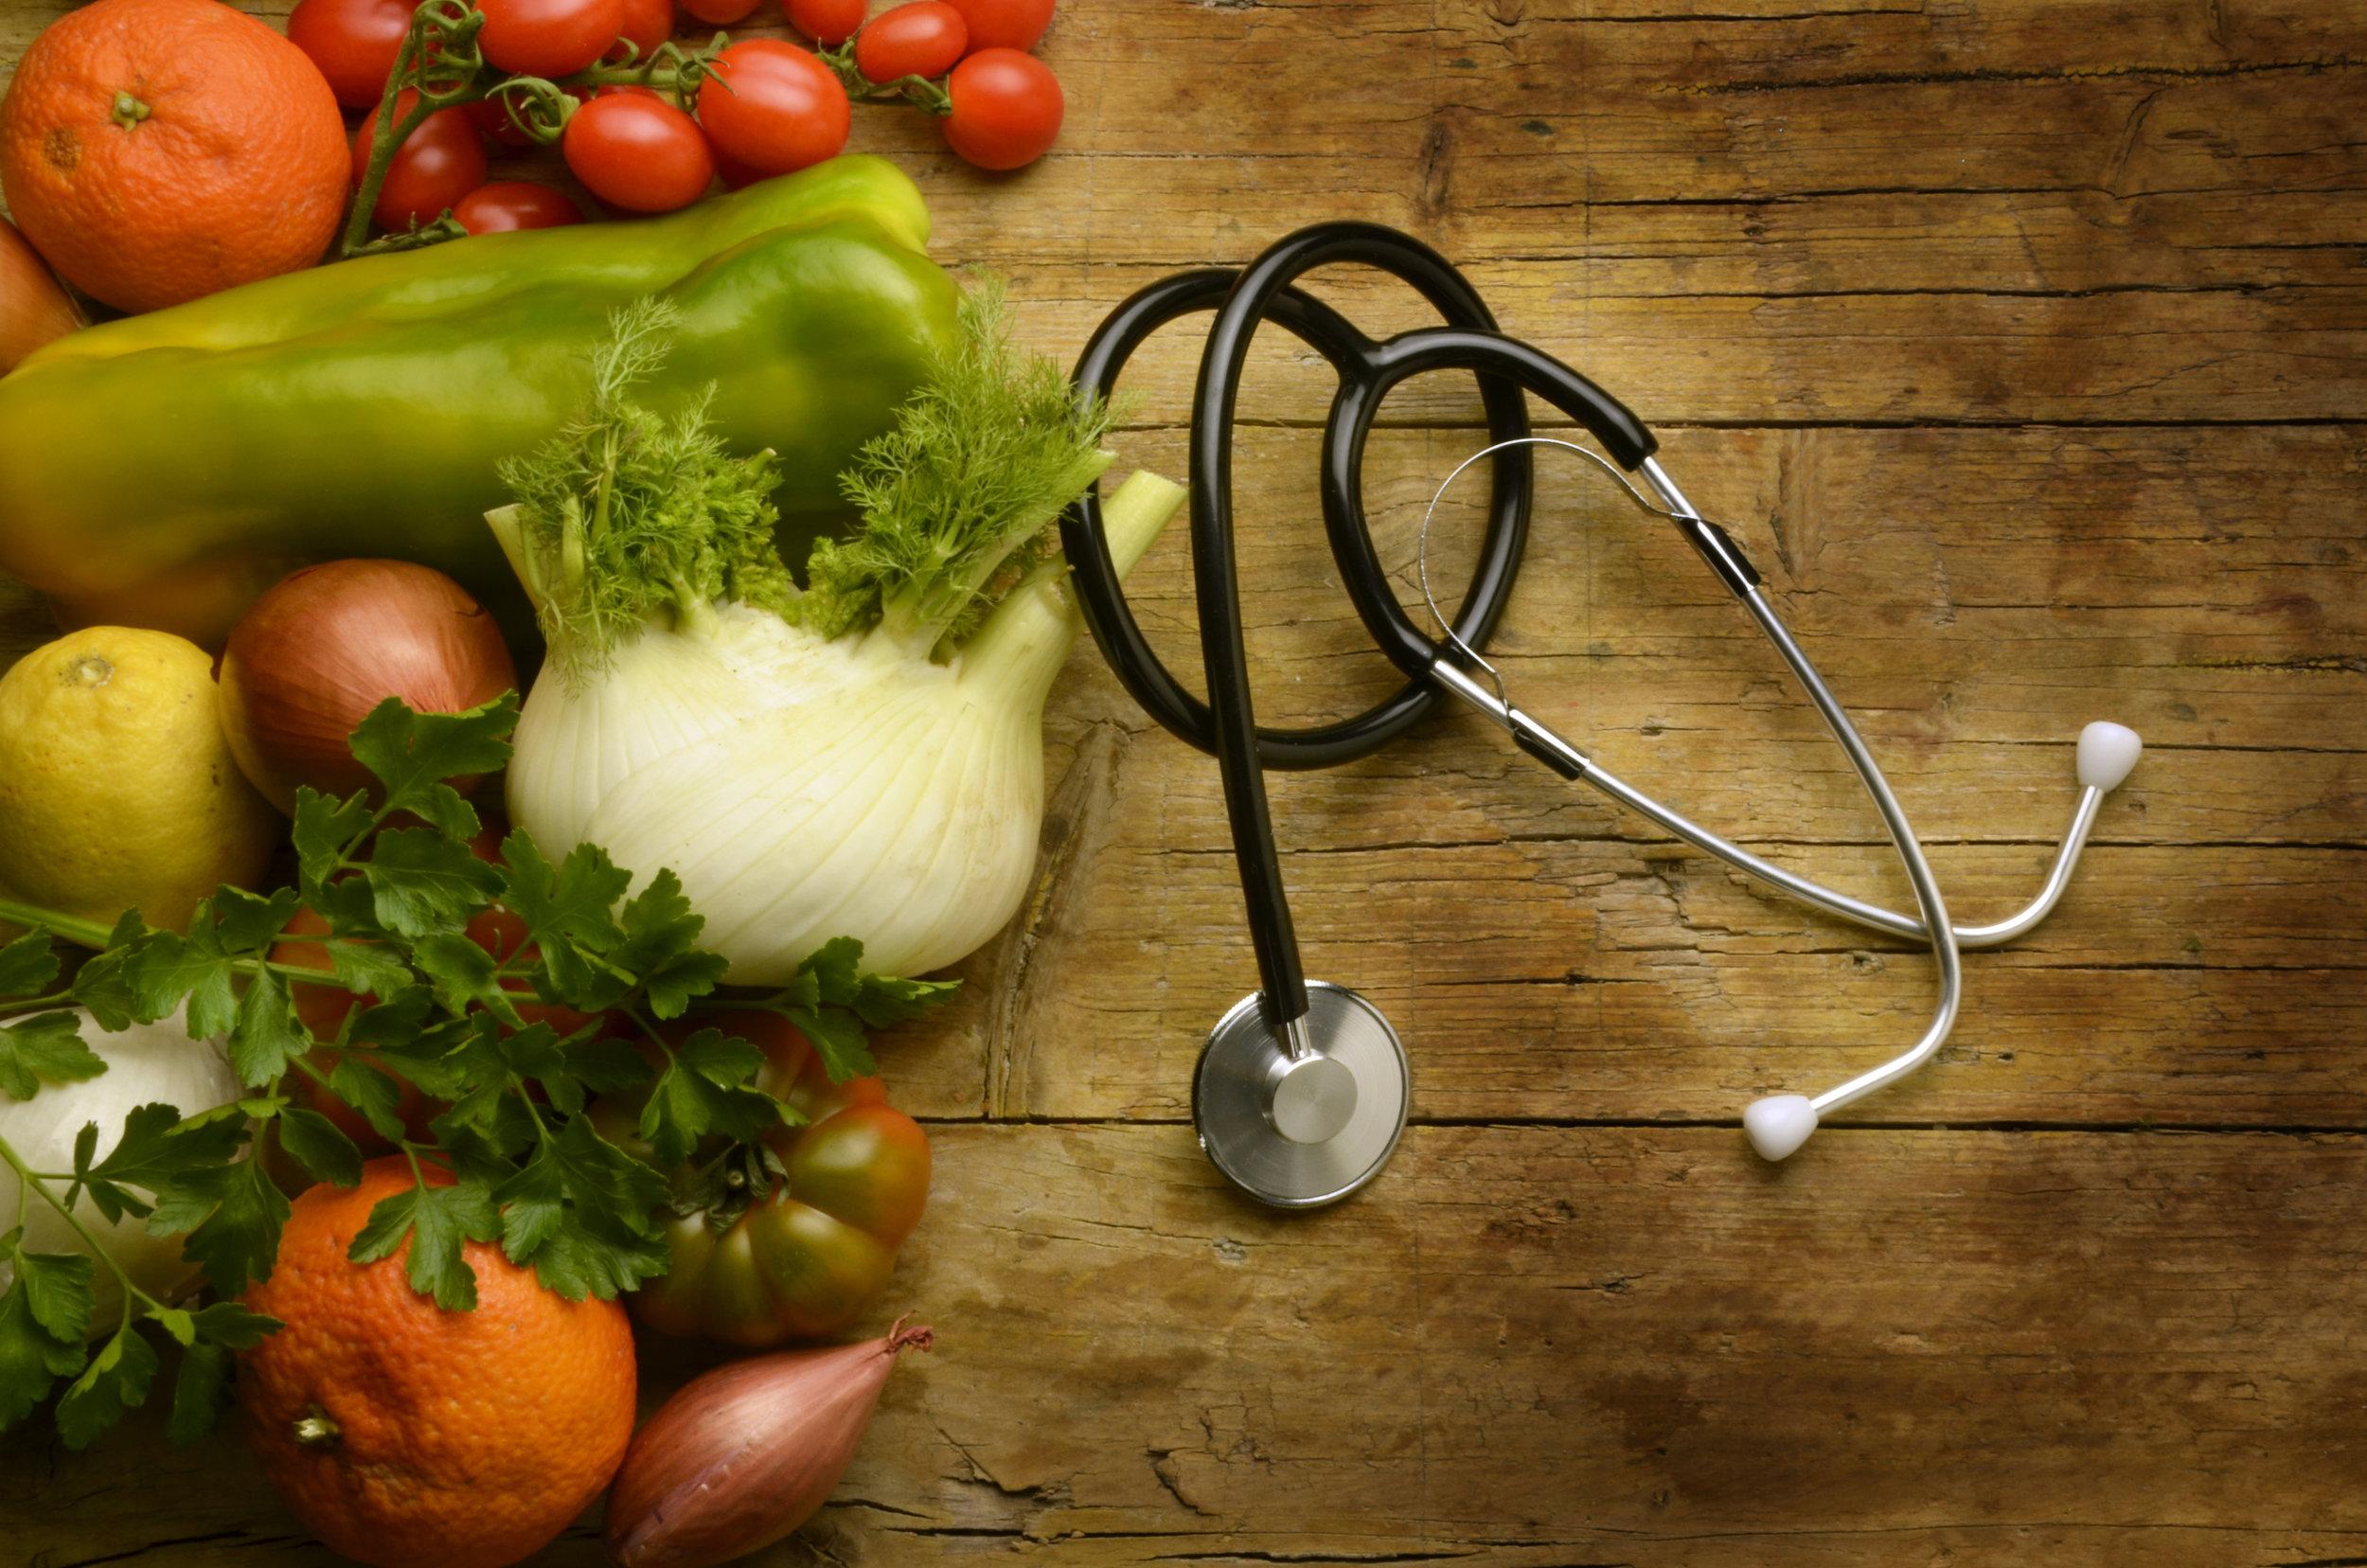 Common Nutrient Deficiencies Associated With Celiac Disease